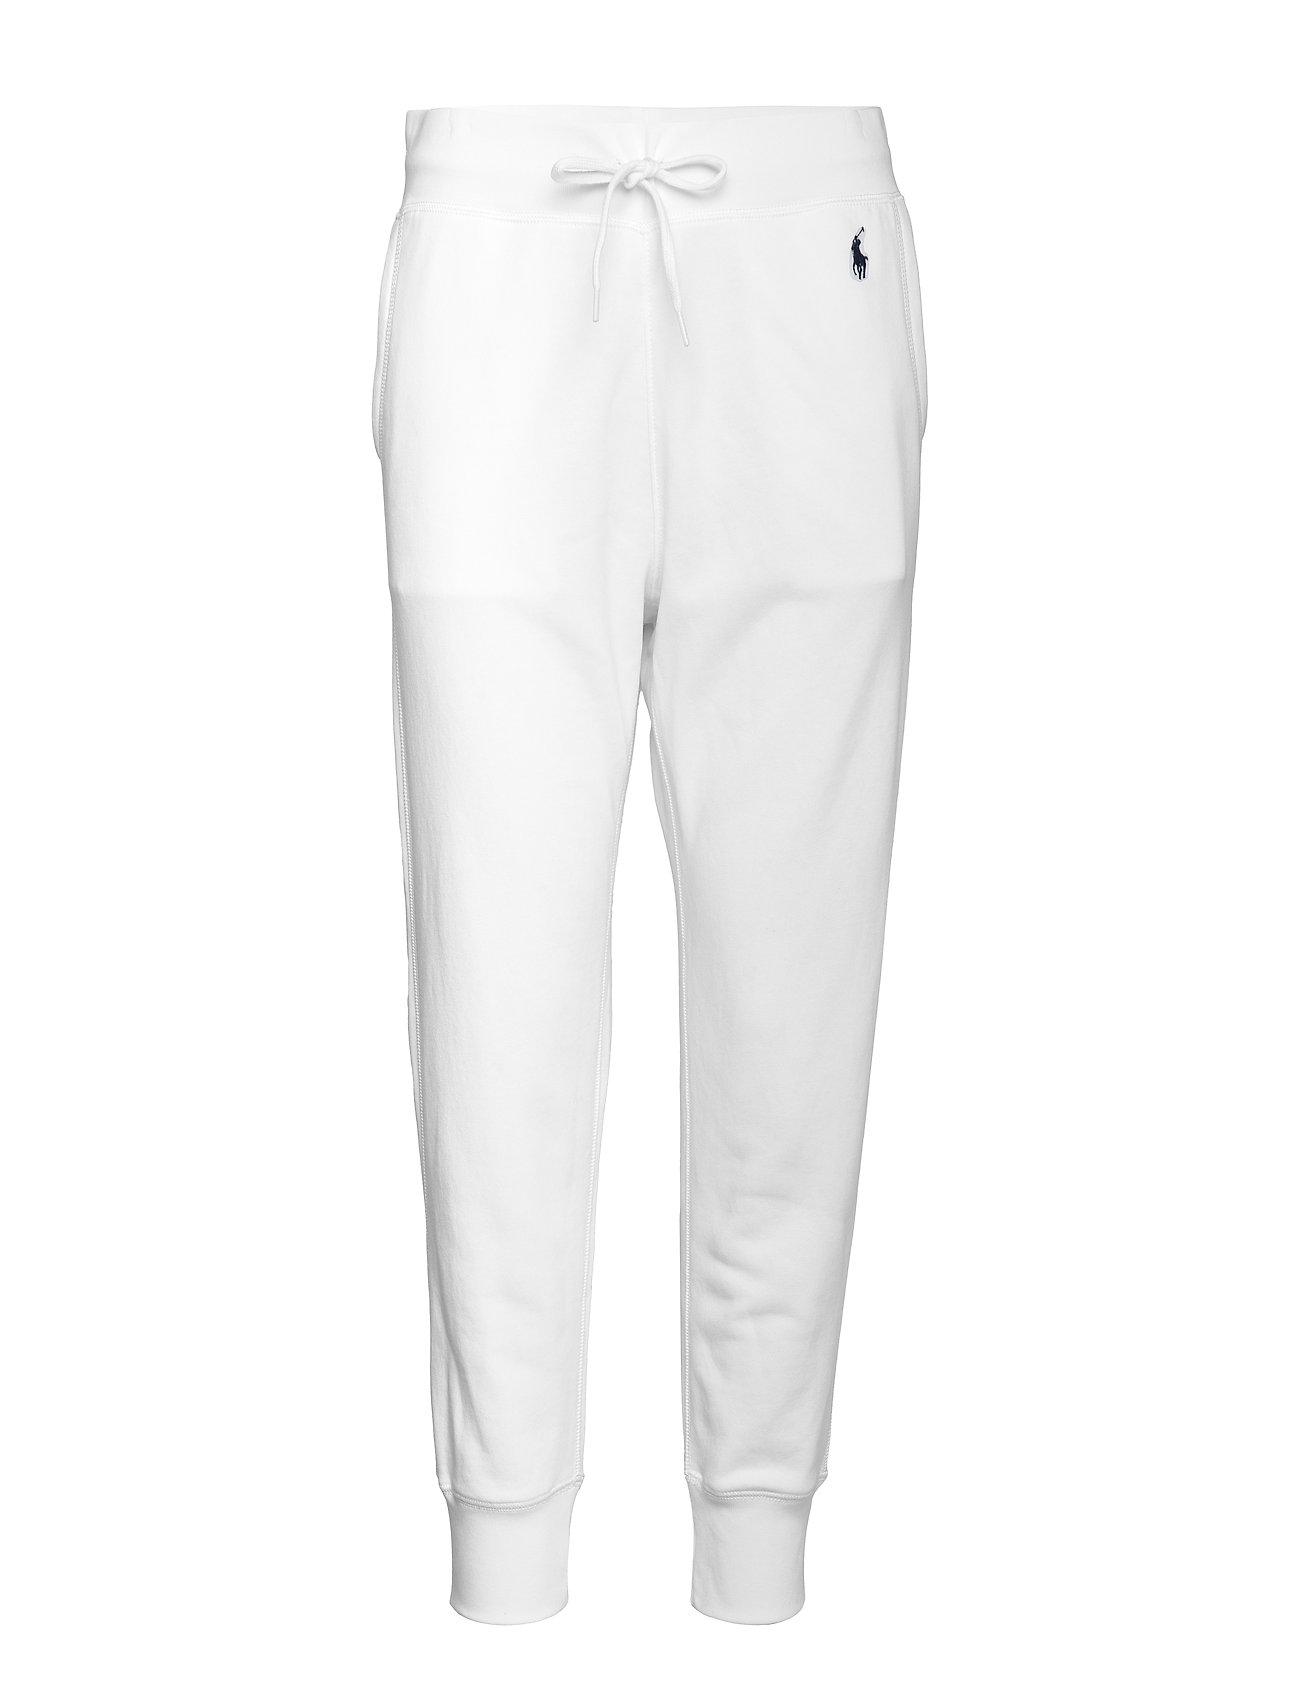 Polo Ralph Lauren Fleece Sweatpant - WHITE